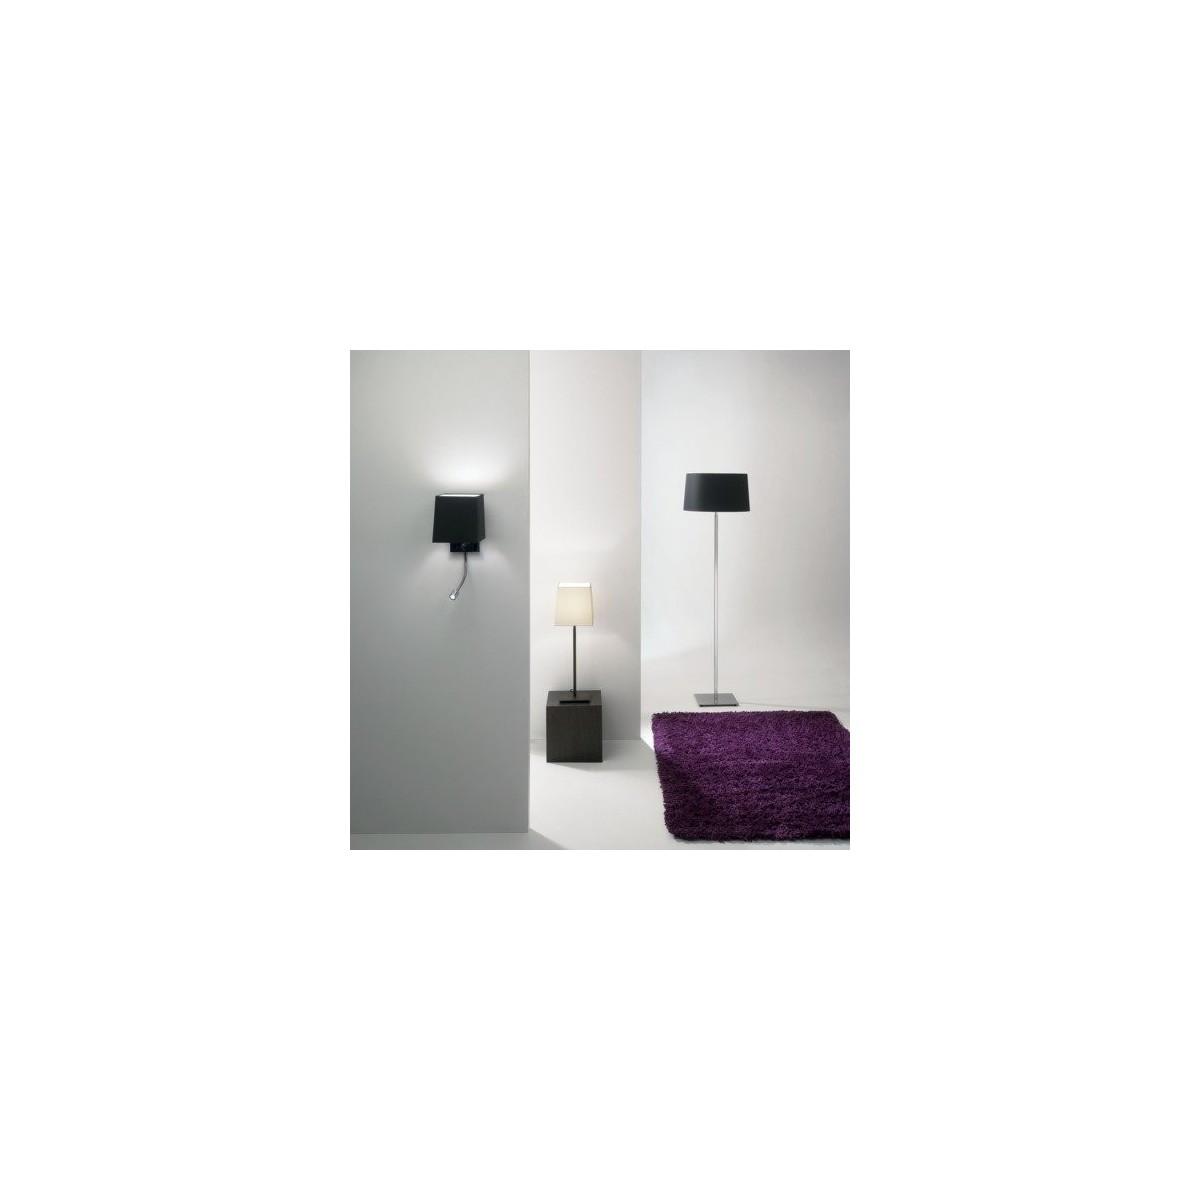 Astro Tapered Square 210 Abażur Biały 5003001